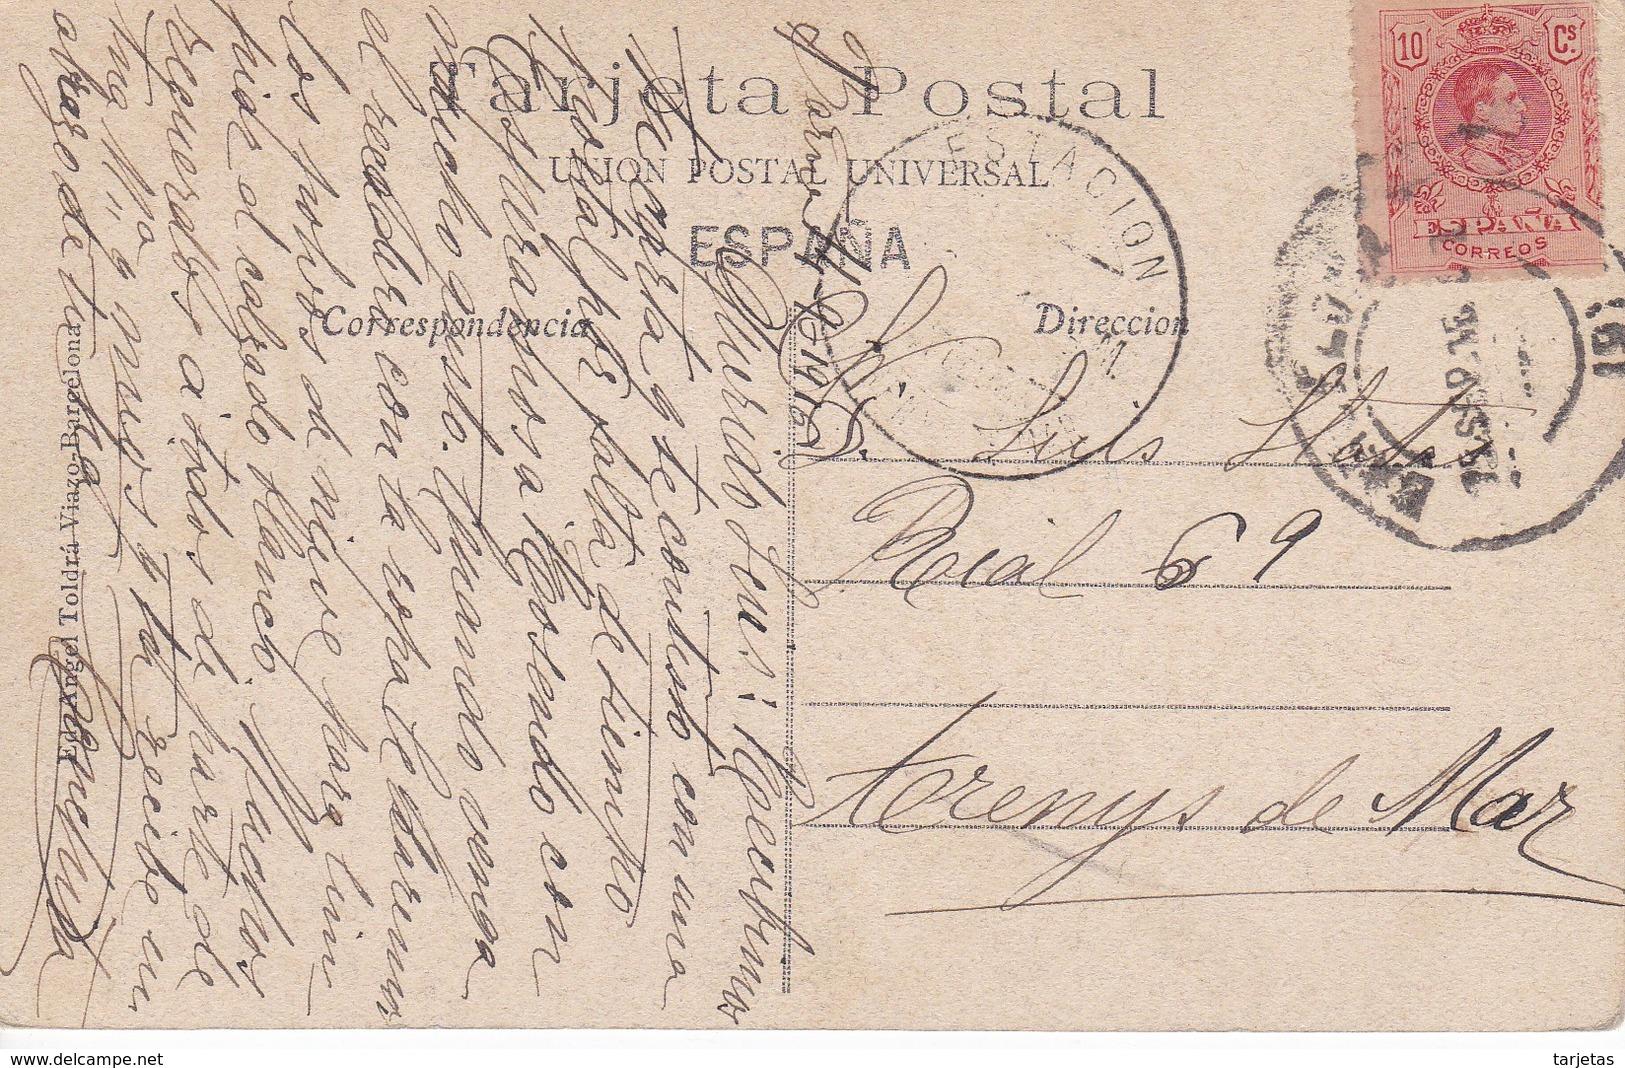 ATV 591 POSTAL DE TORTOSA DE LA CATEDRAL - FACHADA LATERAL DEL AÑO 1916 (ANGEL TOLDRA) (TARRAGONA) - Tarragona